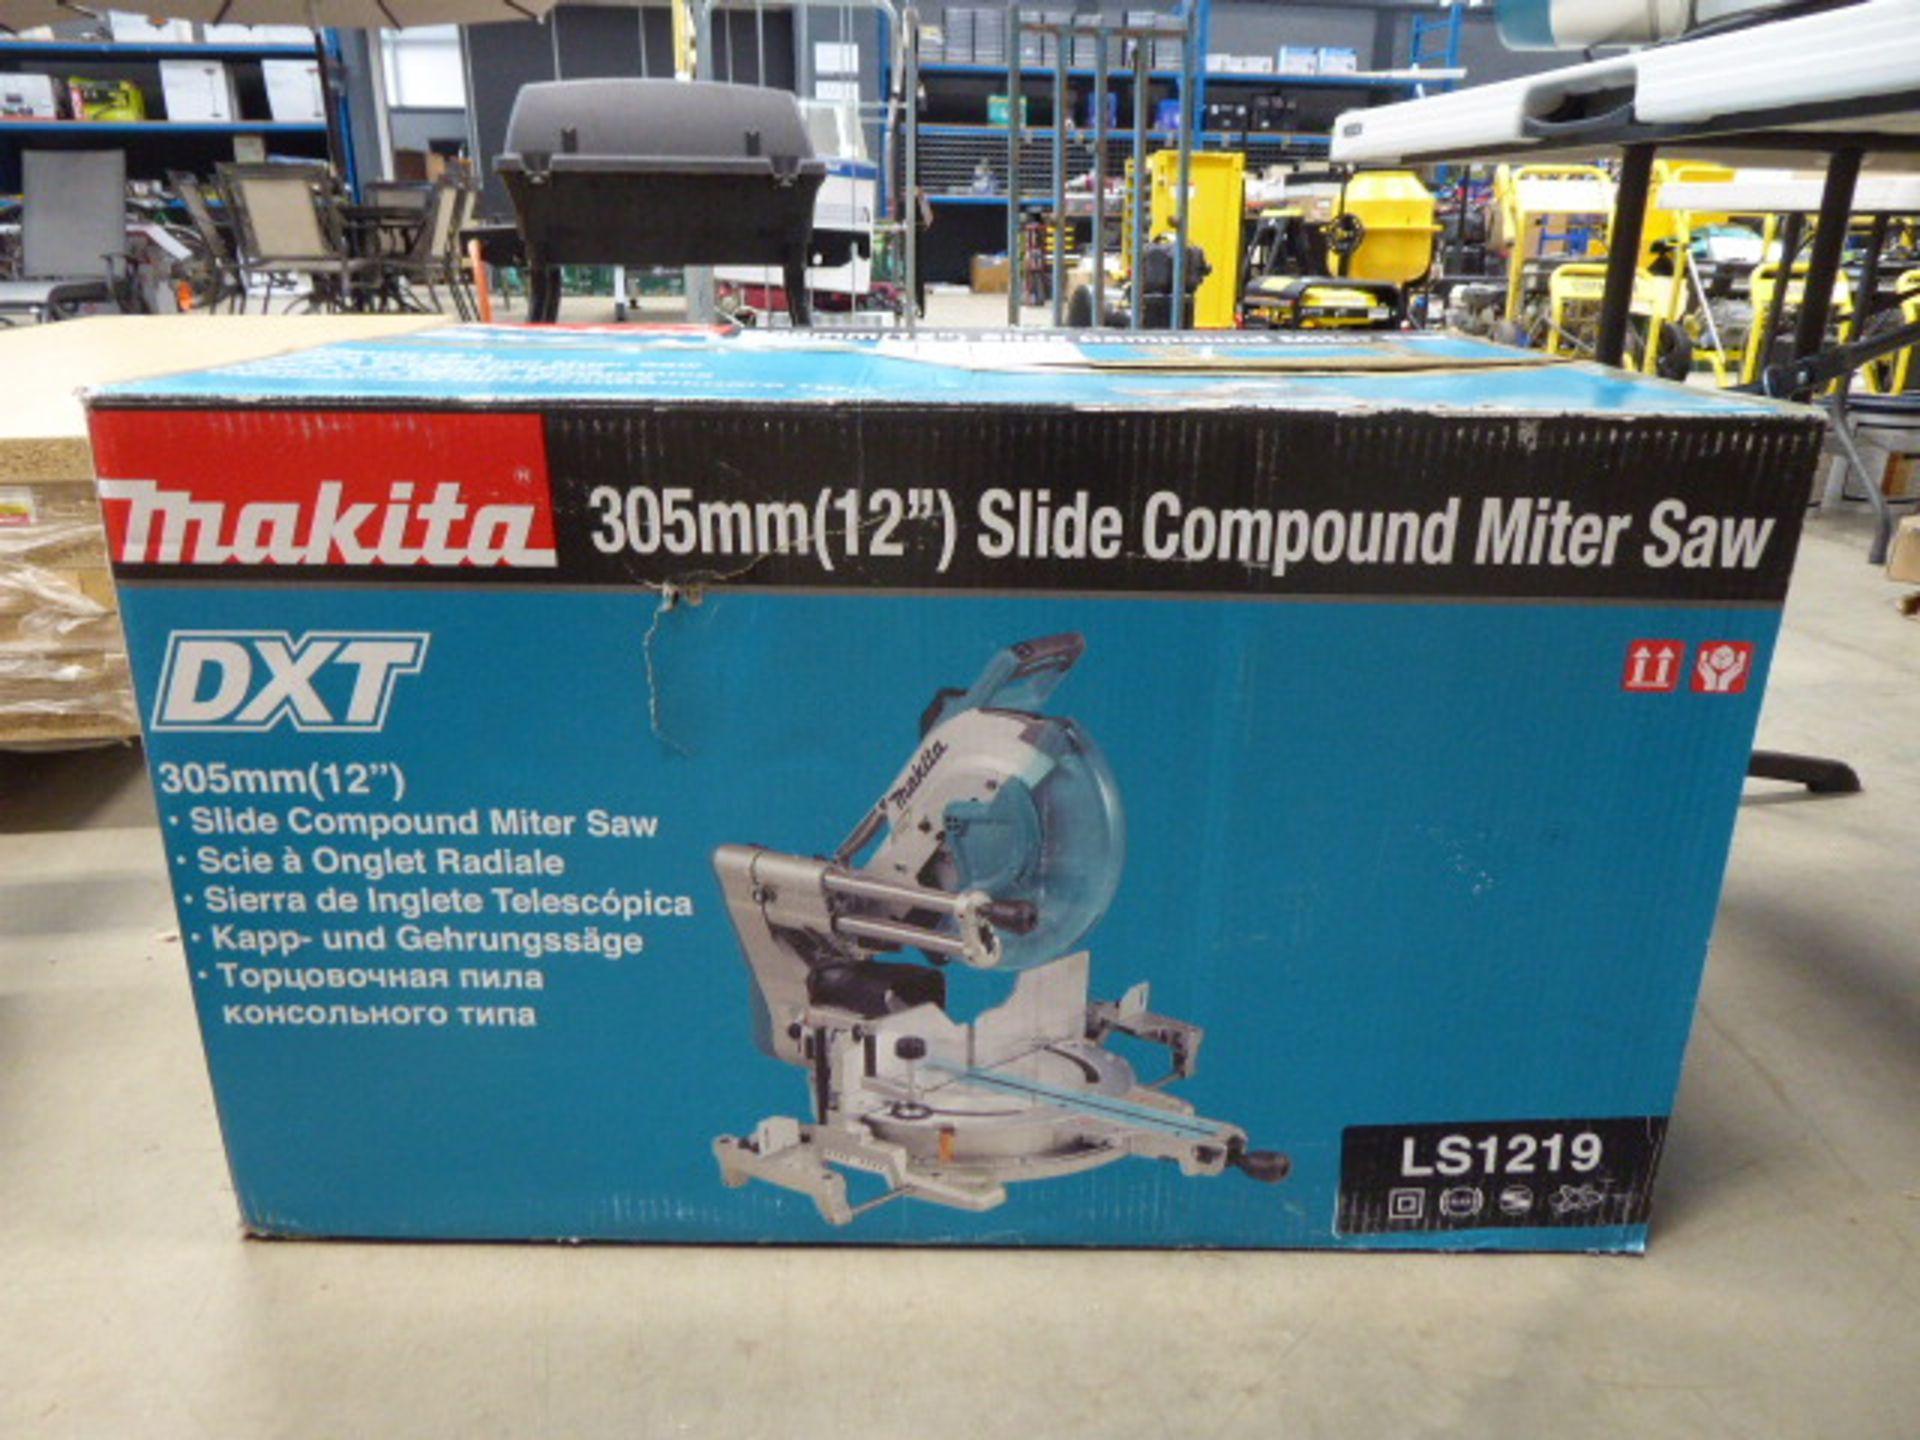 Makita 305mm slide compound mitre saw - Image 7 of 7